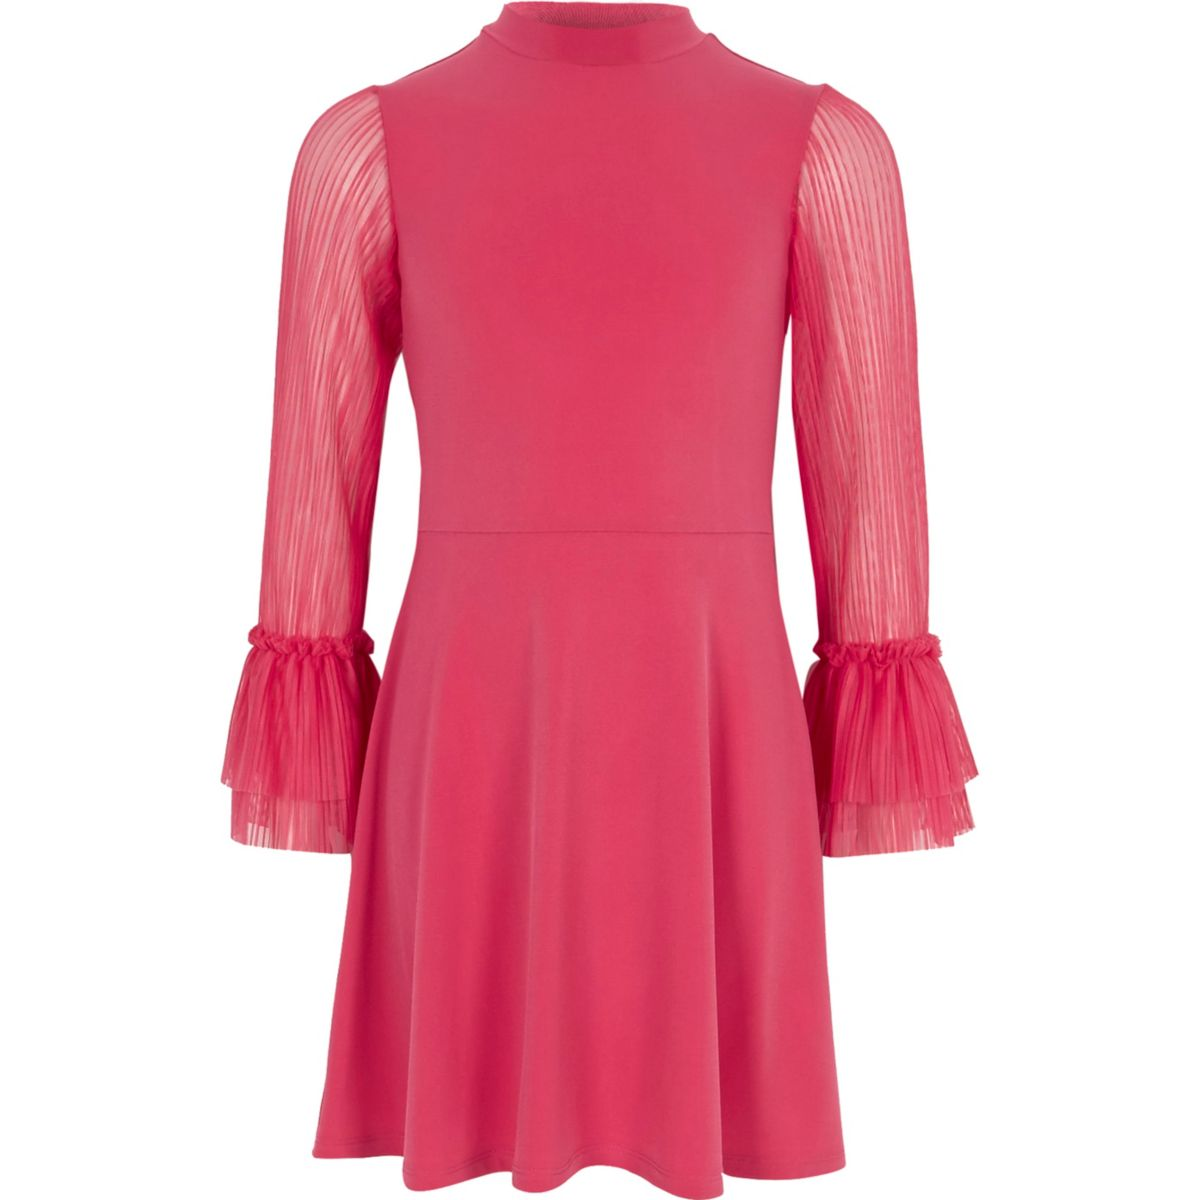 Girls pink pleated mesh sleeve skater dress